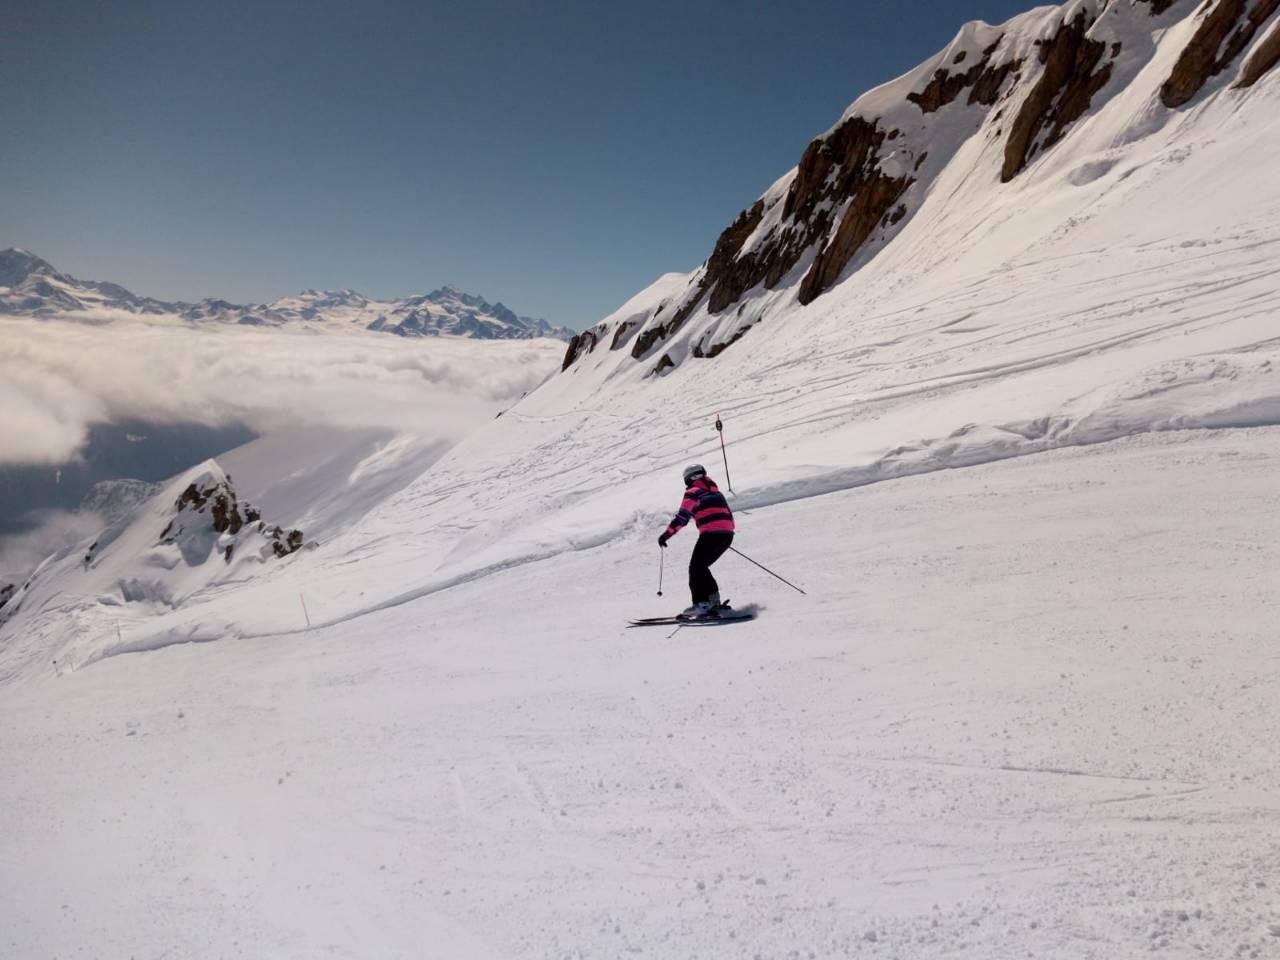 levensveranderend wintersport